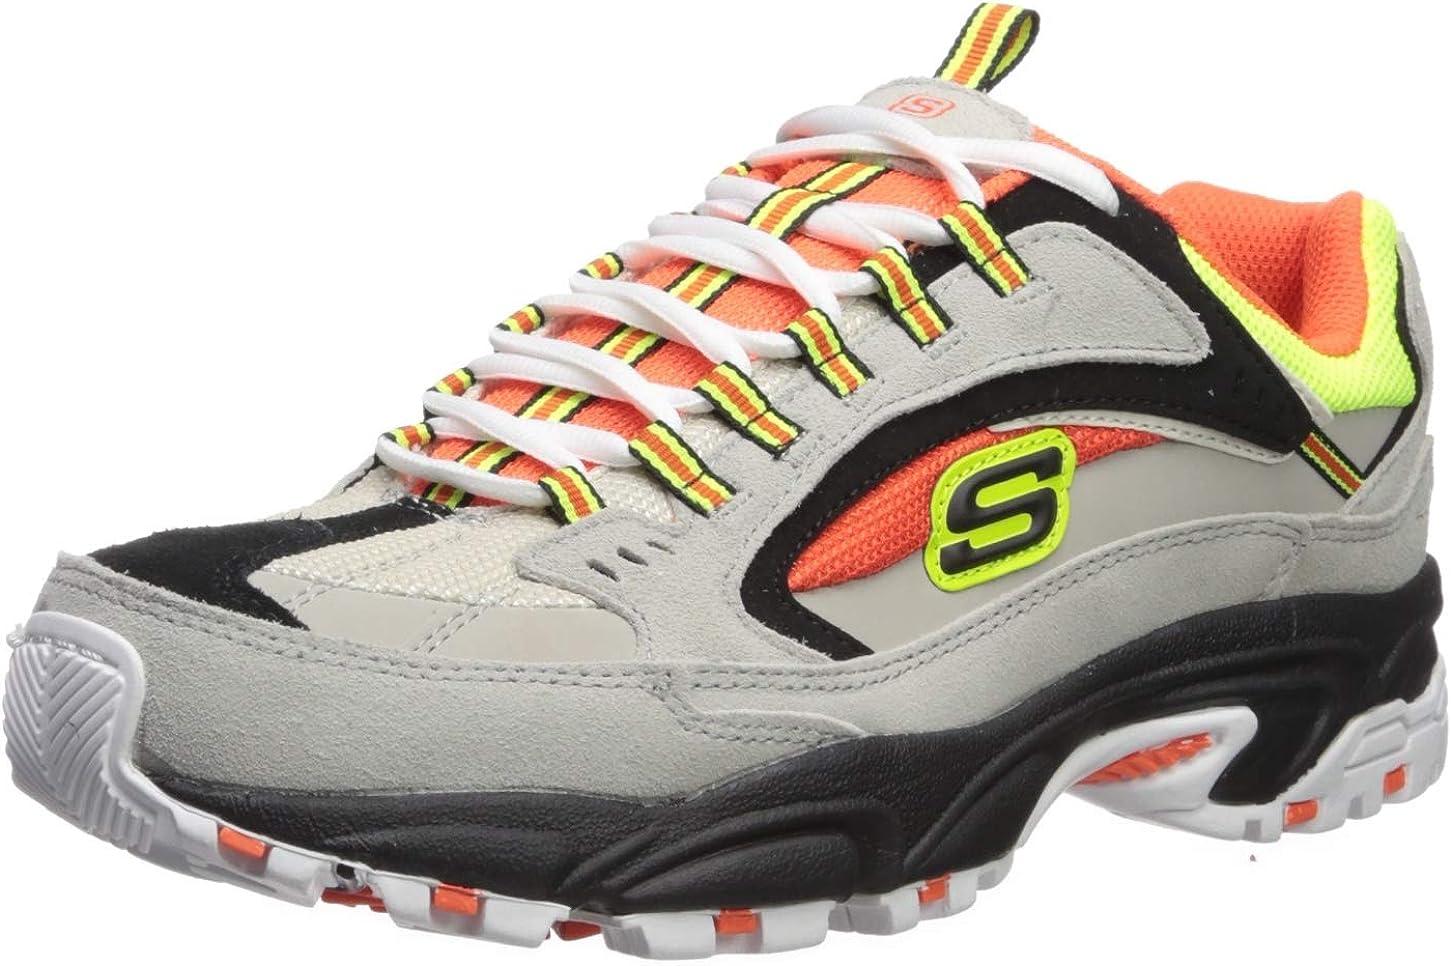 Skechers Stamina Cutback, Baskets Homme: